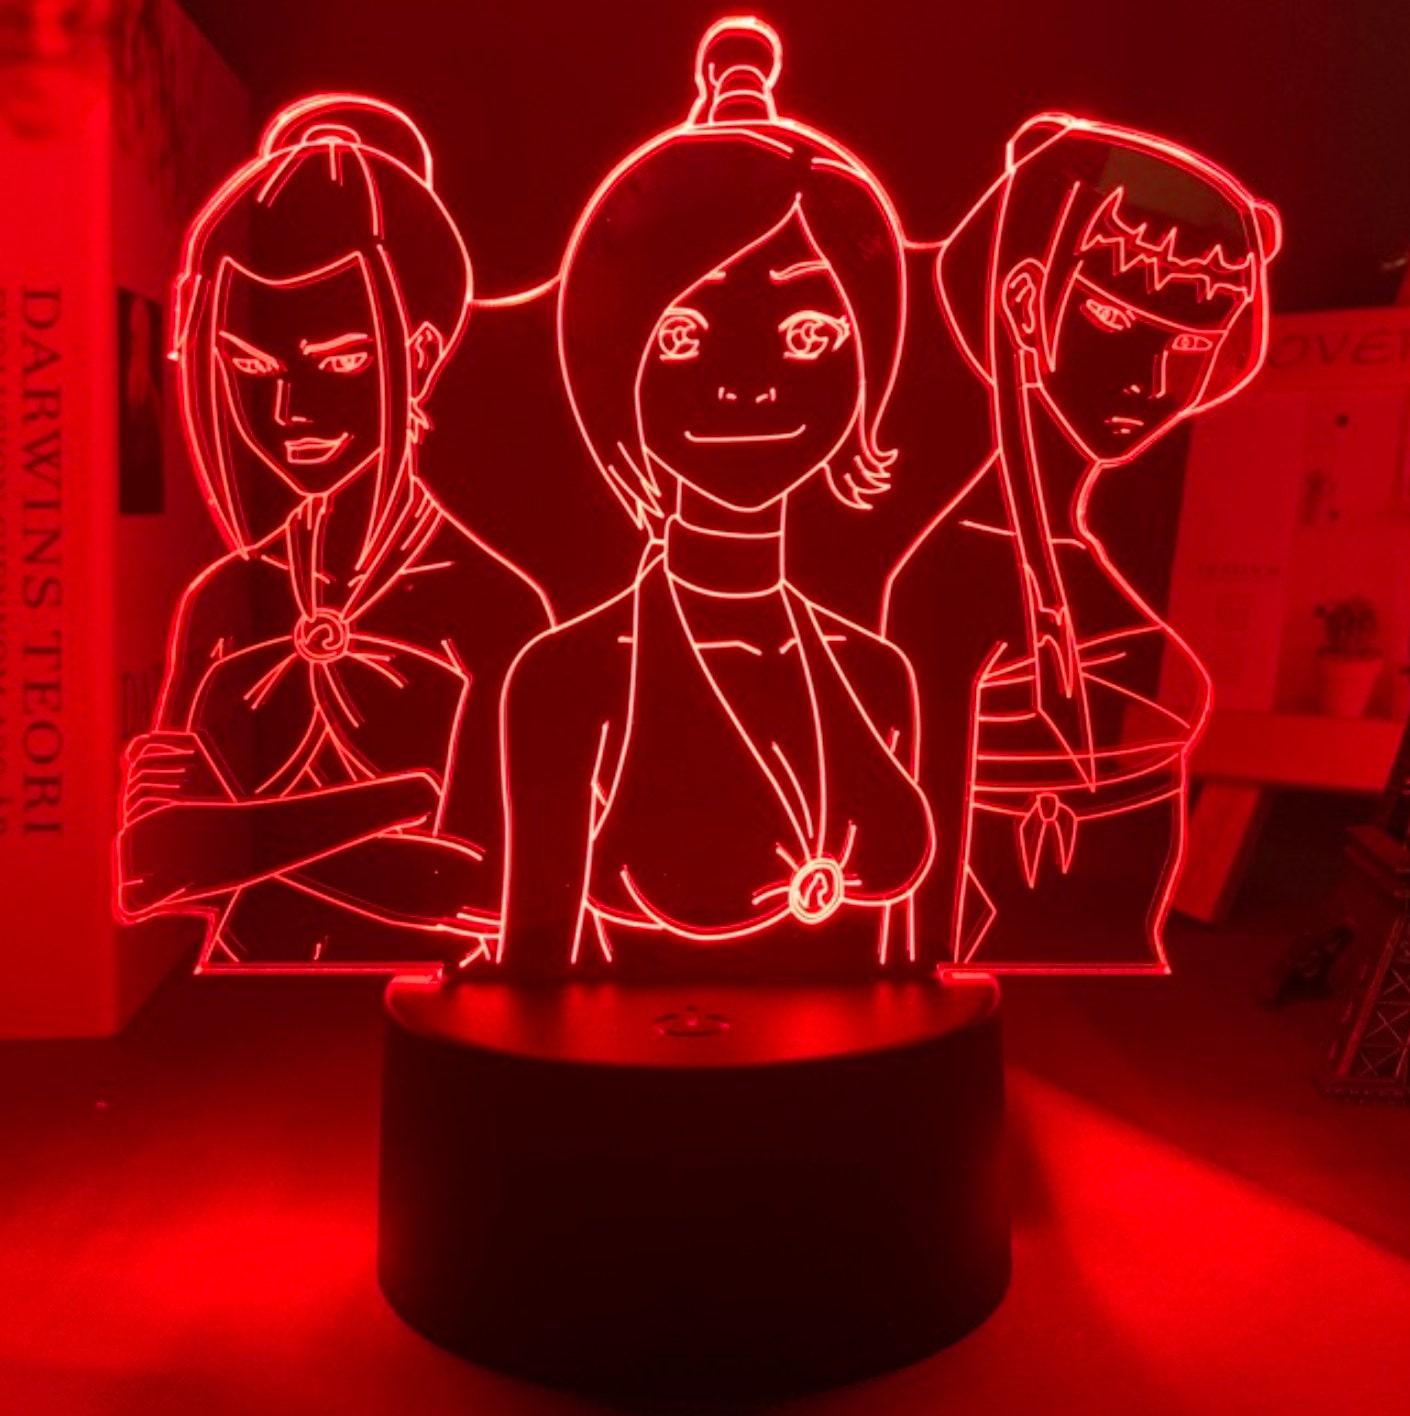 AZULA MAI TY Lee Azula Team aus Anime Avatar die letzte | Etsy